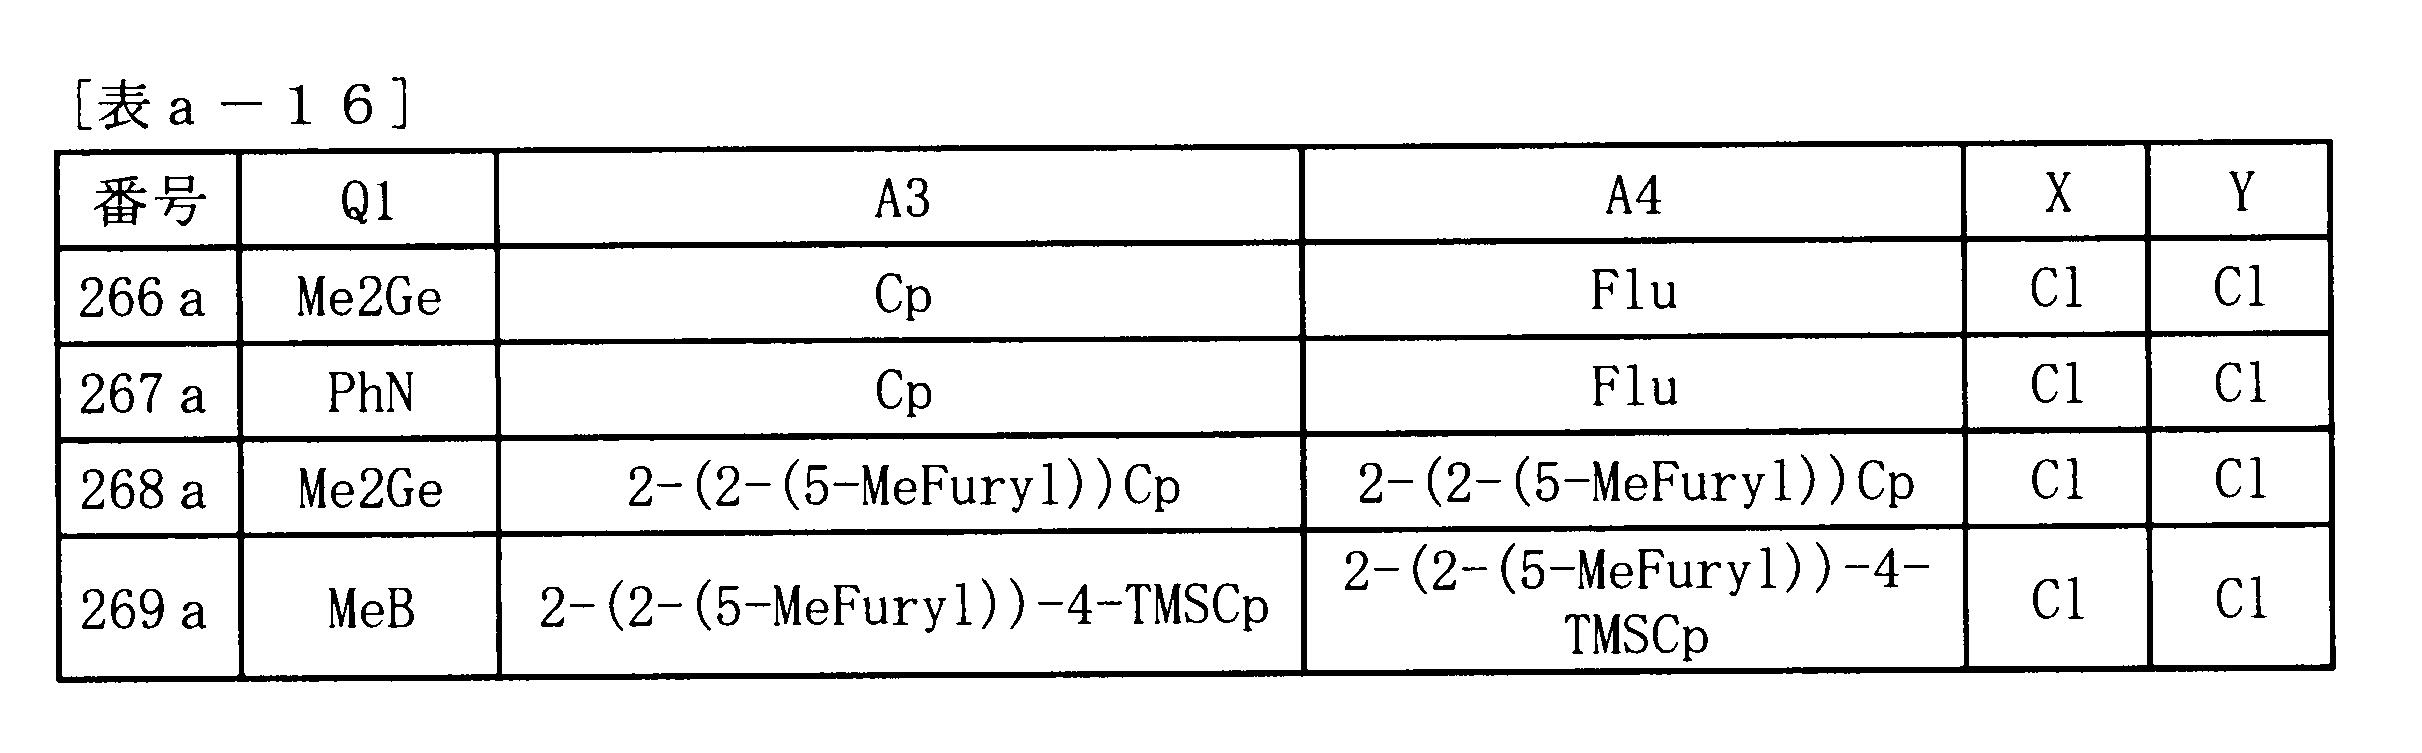 Patents                                                                                                                         Generate link with comments                           エチレン系重合体、ポリエチレン系樹脂組成物とその用途、オレフィン重合用触媒成分、該成分を含むオレフィン重合用触媒および該触媒を用いたエチレン系重合体の製造方法